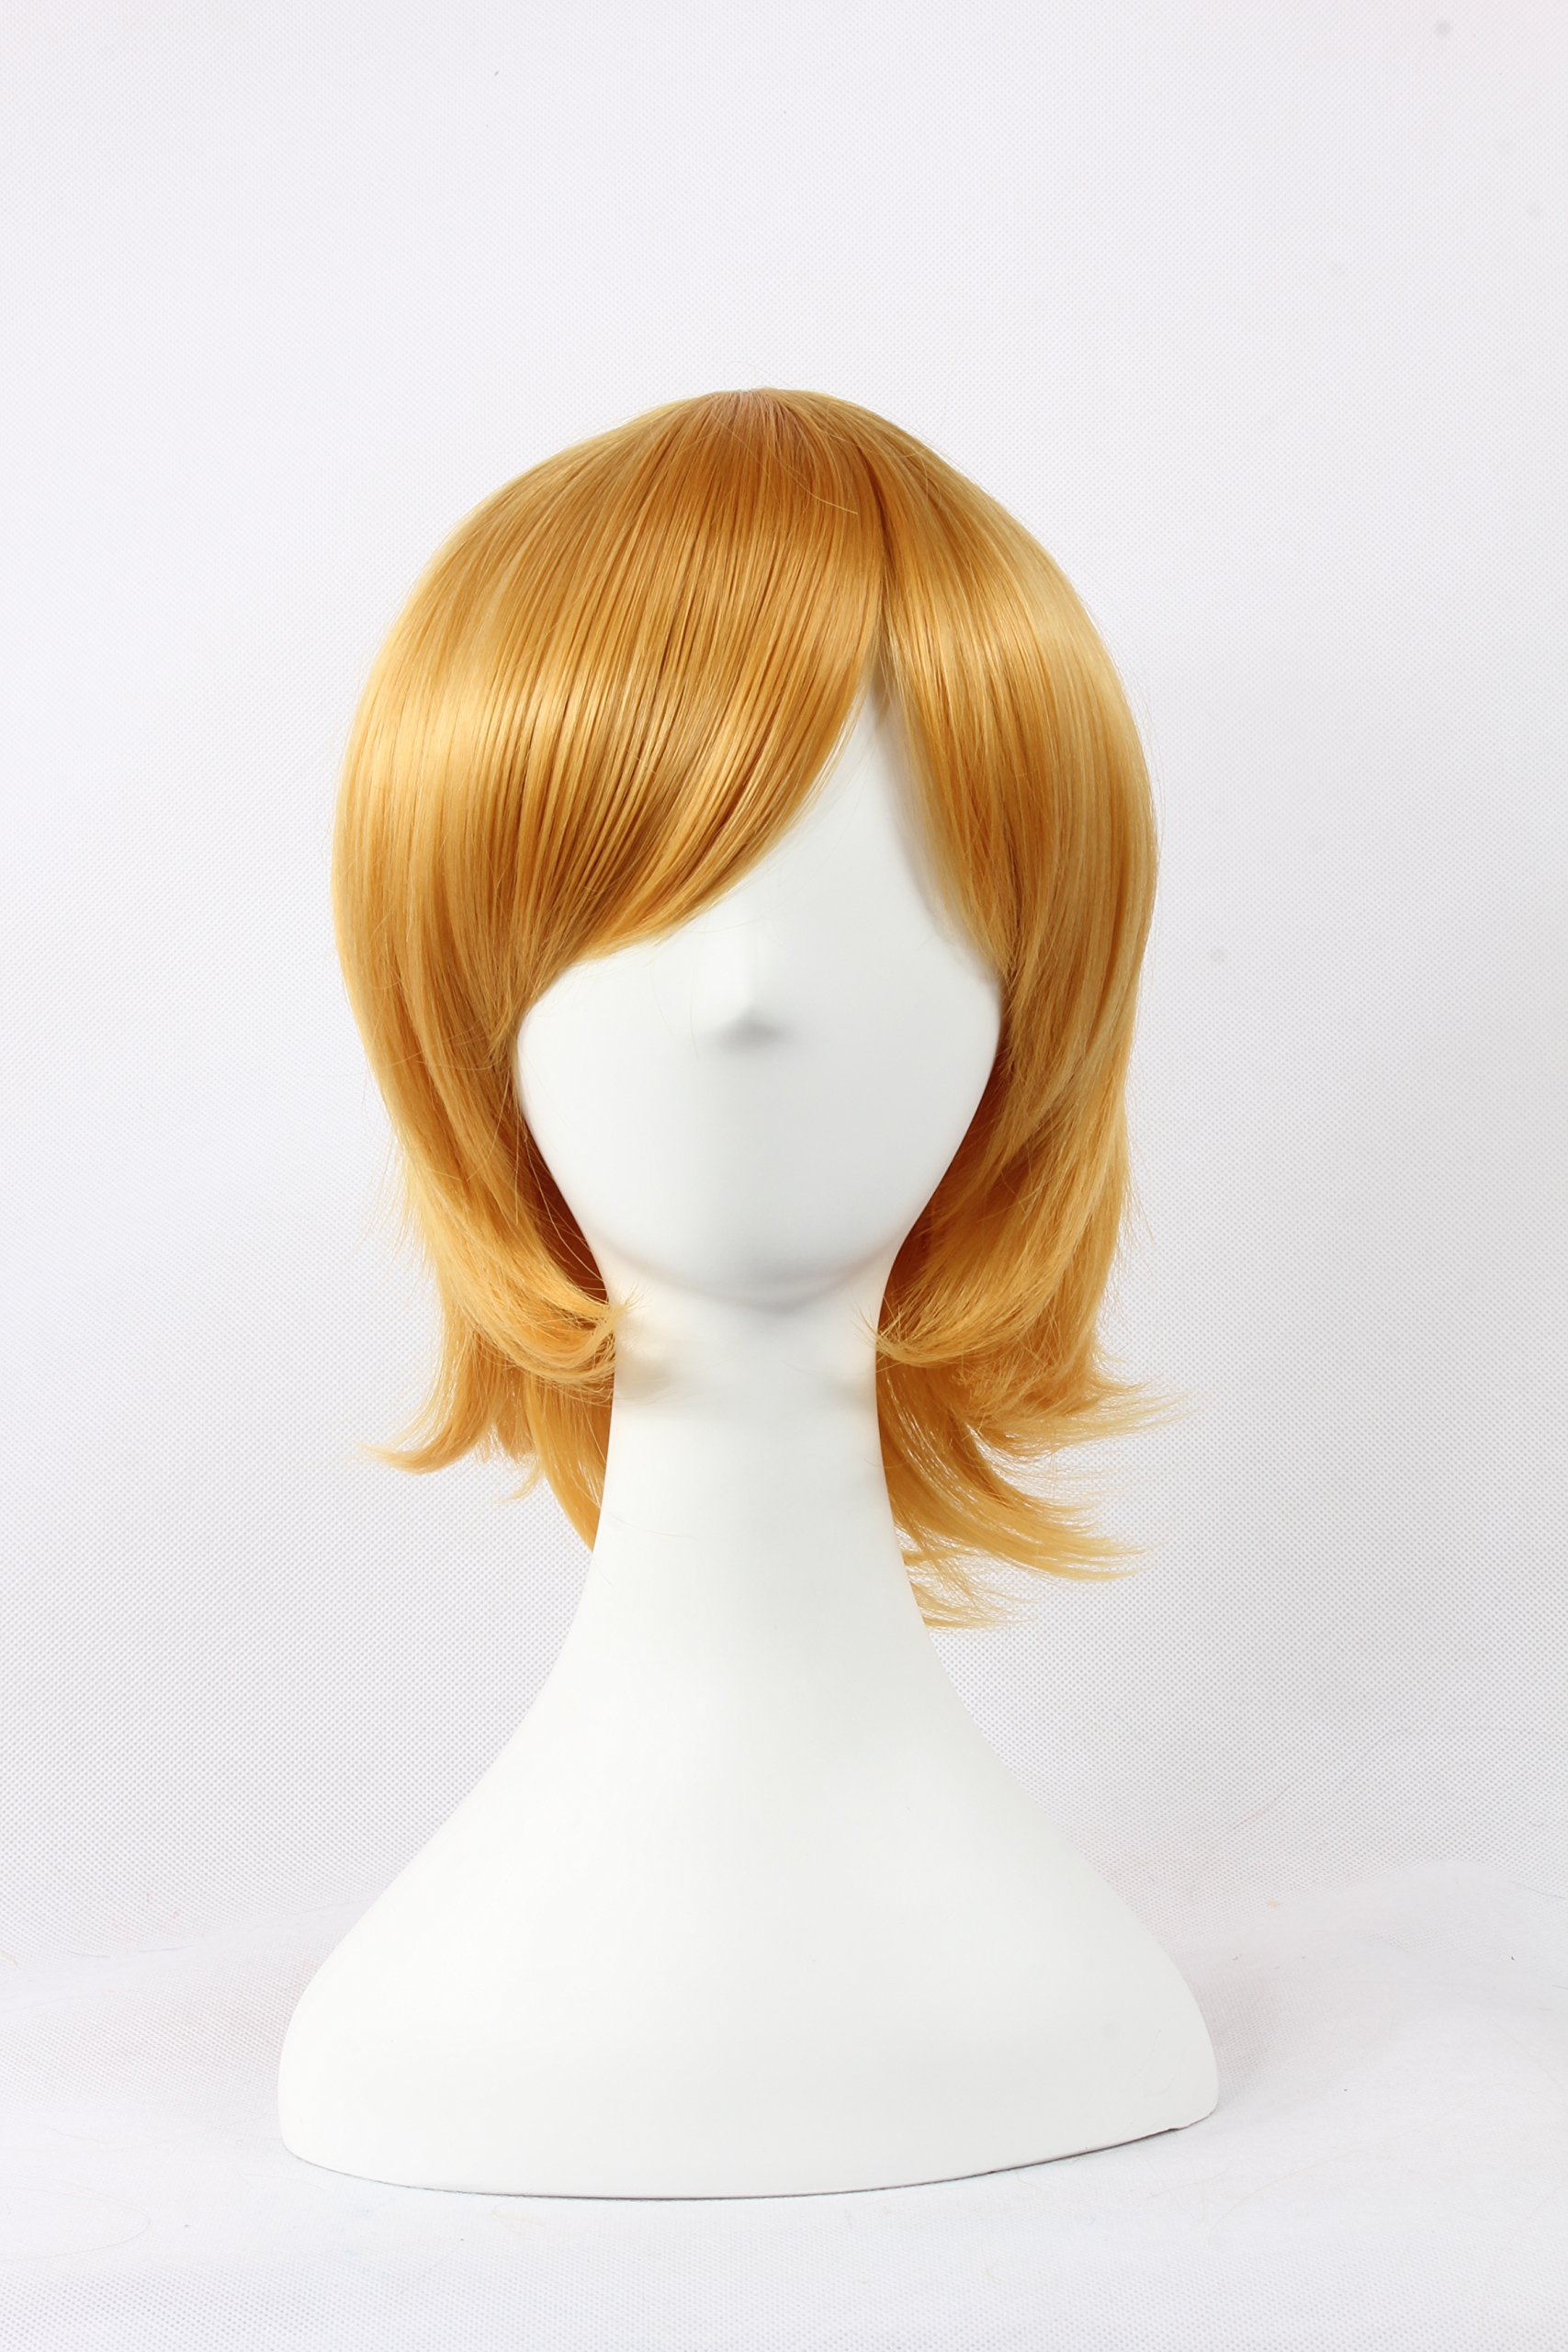 Coolsky Wigs Neon Genesis Evangelion,Light Katekyo Hitman Reborn,Jigoku Shoujo Golden Yellow Hair Cosplay by COOLSKY (Image #1)